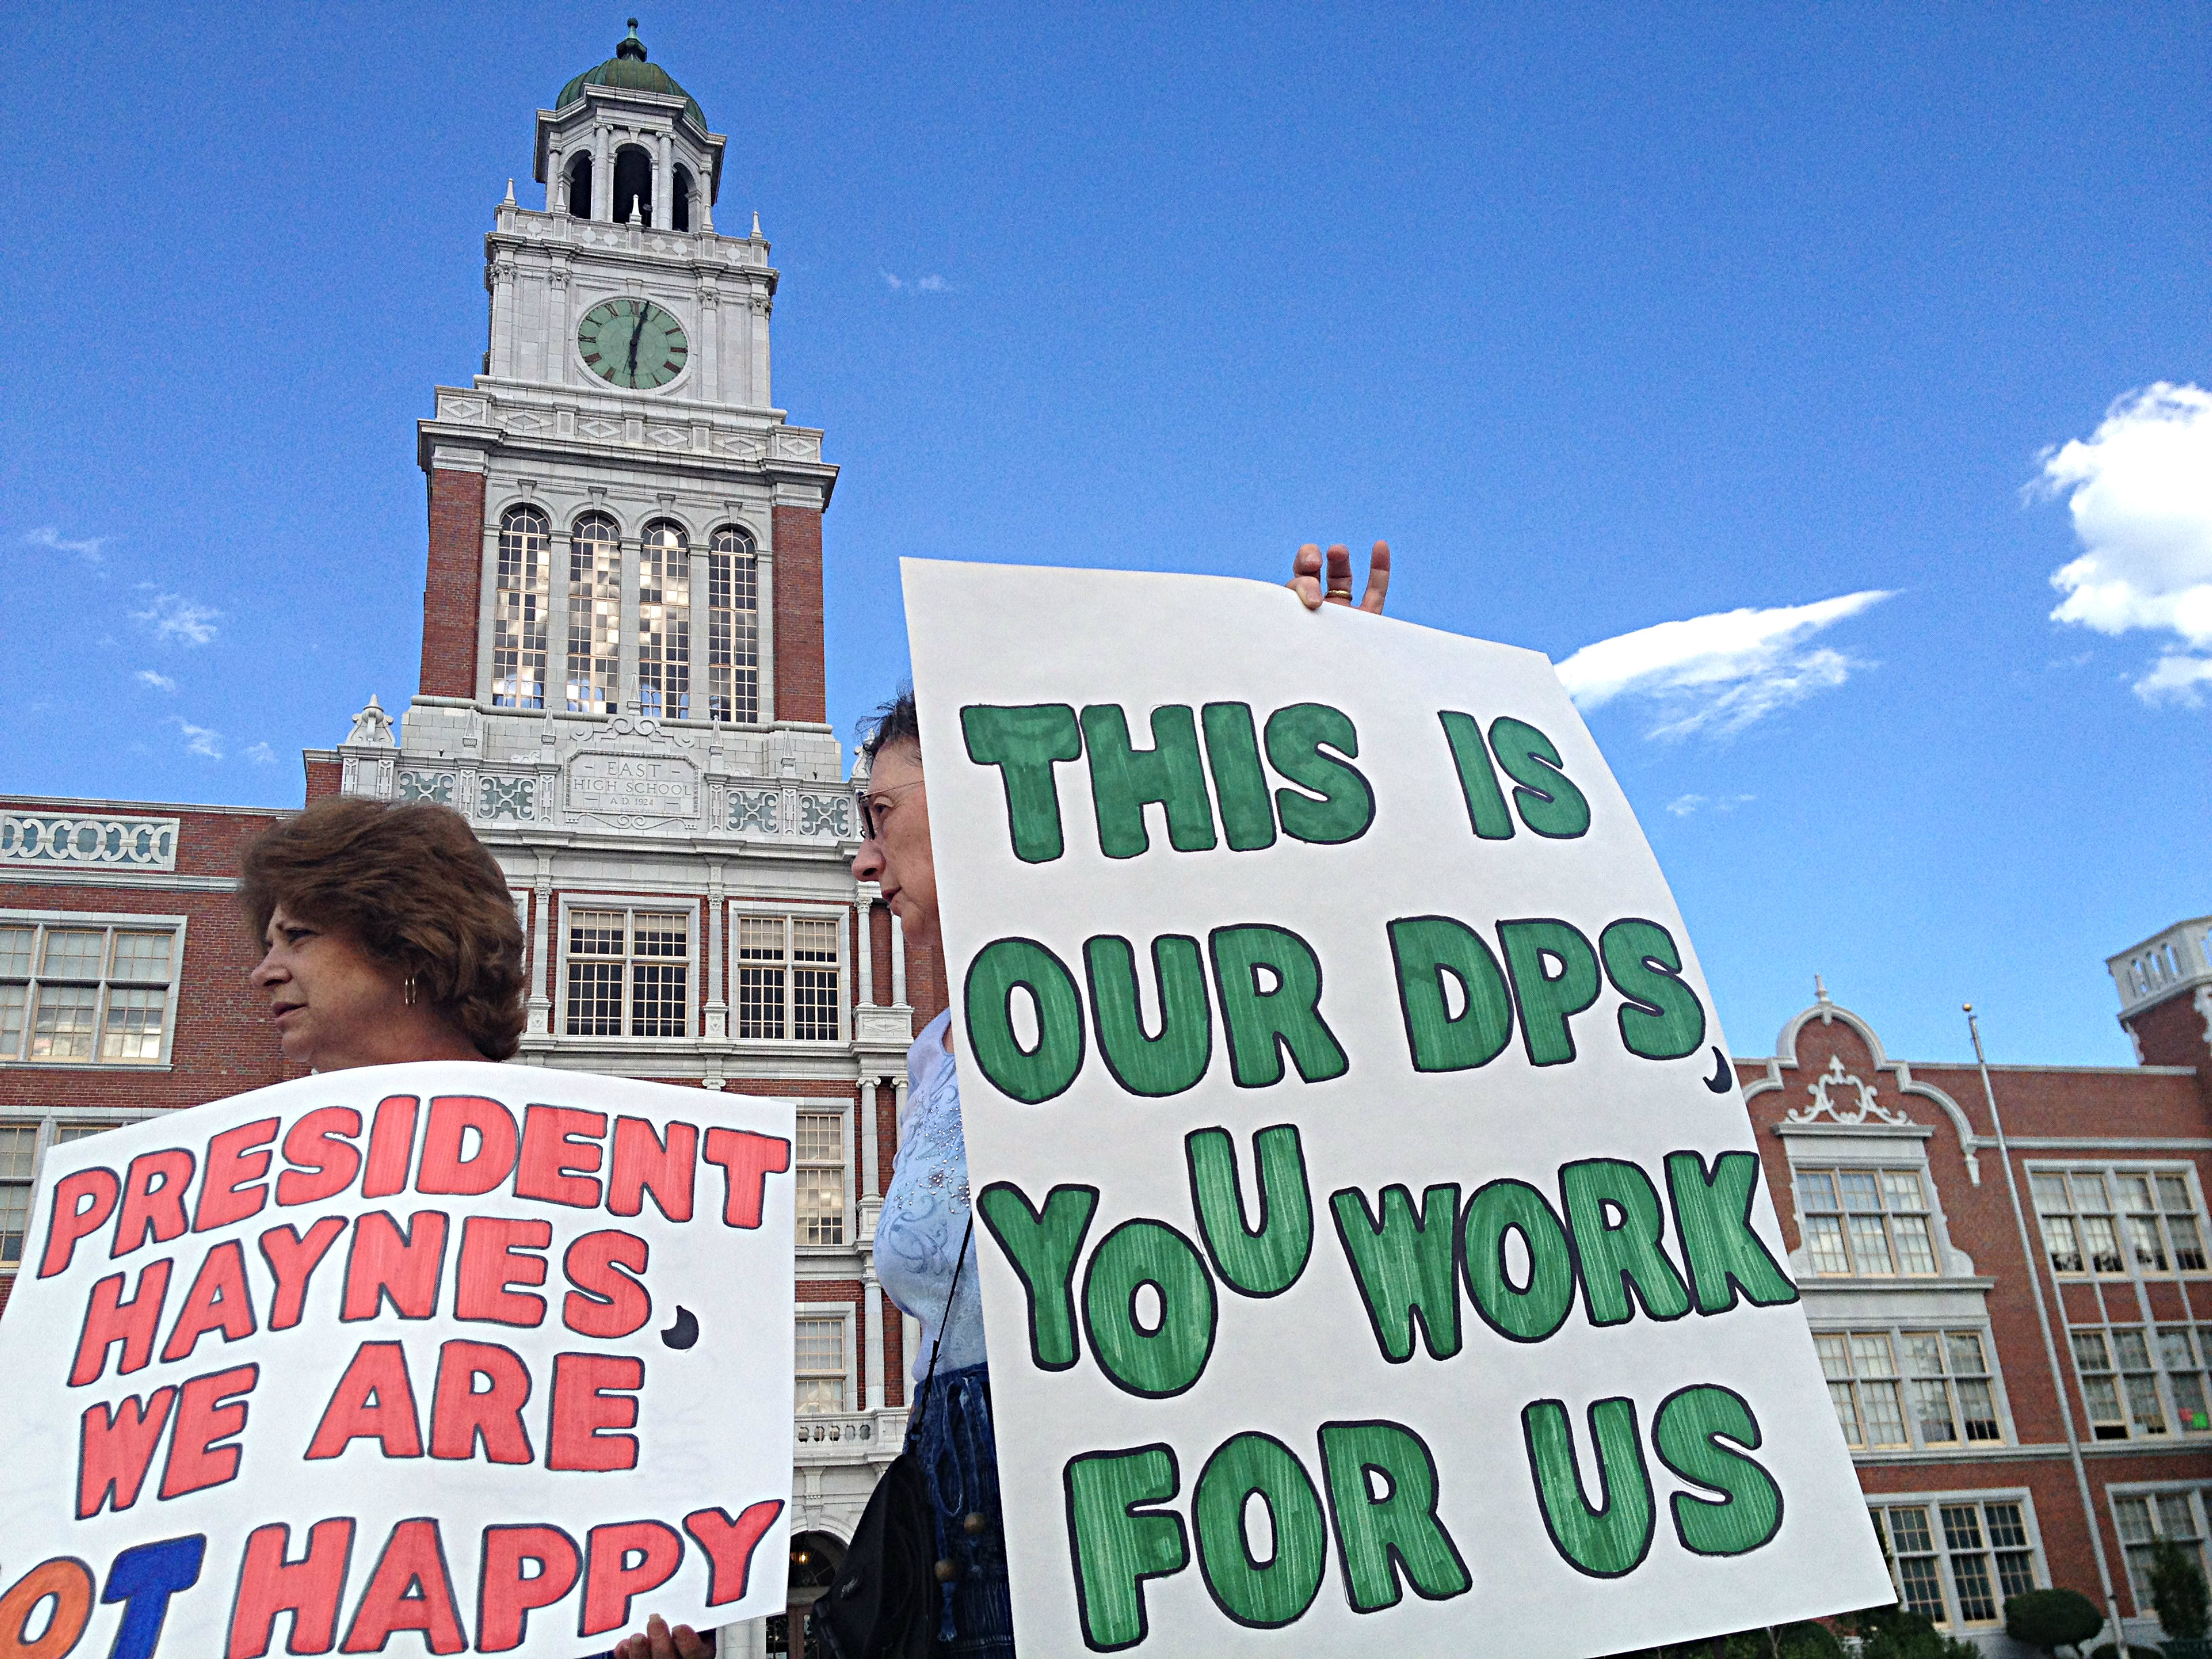 Photo: East High School demo